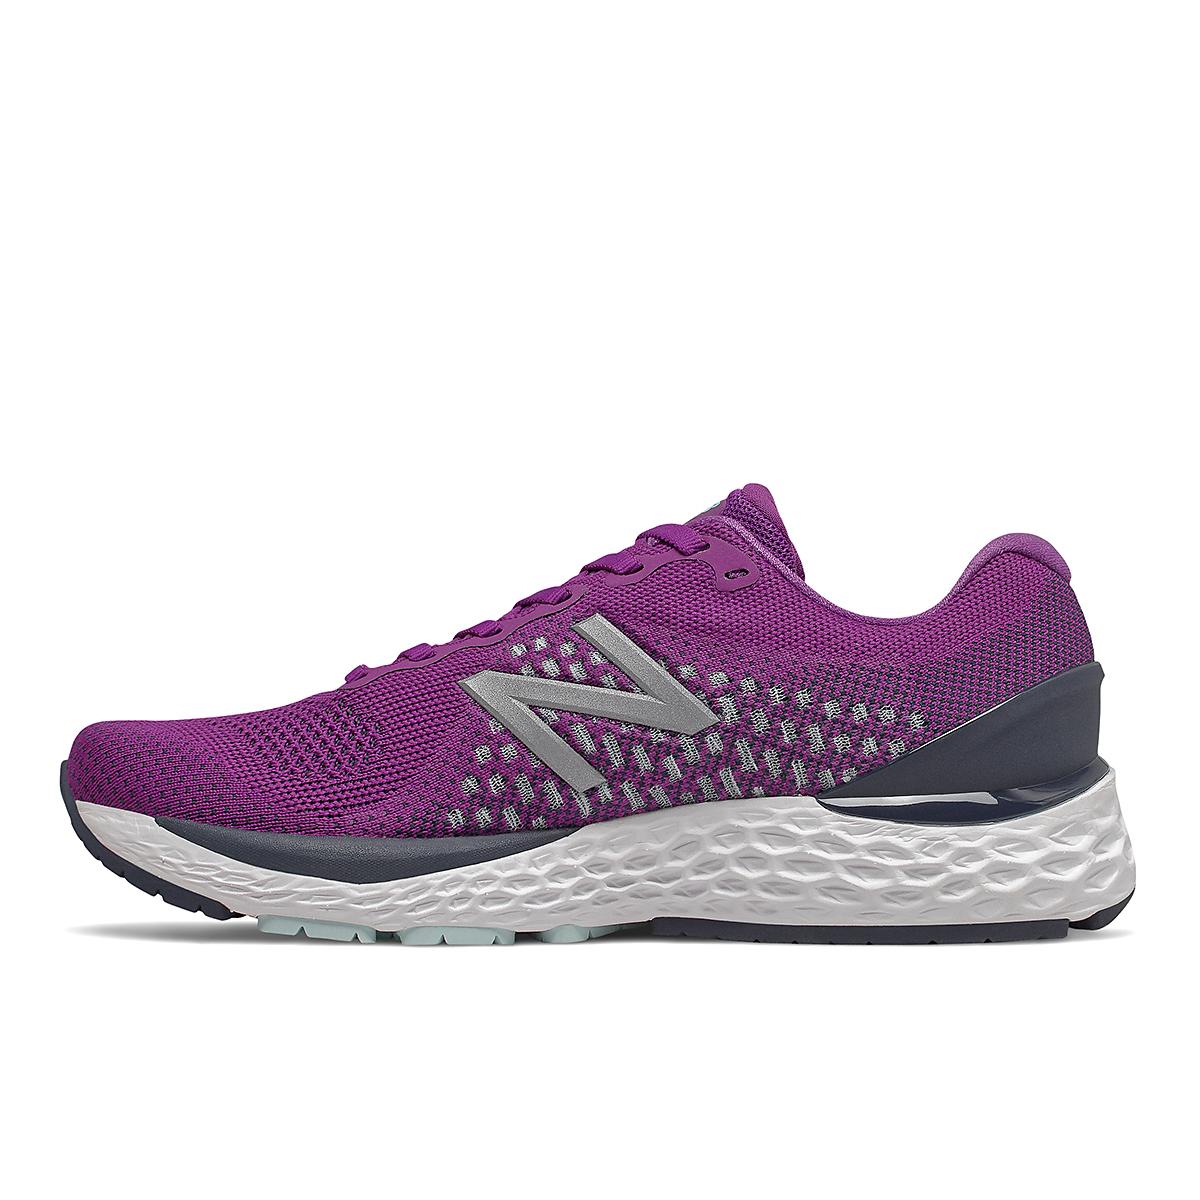 Women's New Balance 880V10 Running Shoe - Color: Plum - Size: 5 - Width: Narrow, Plum, large, image 2